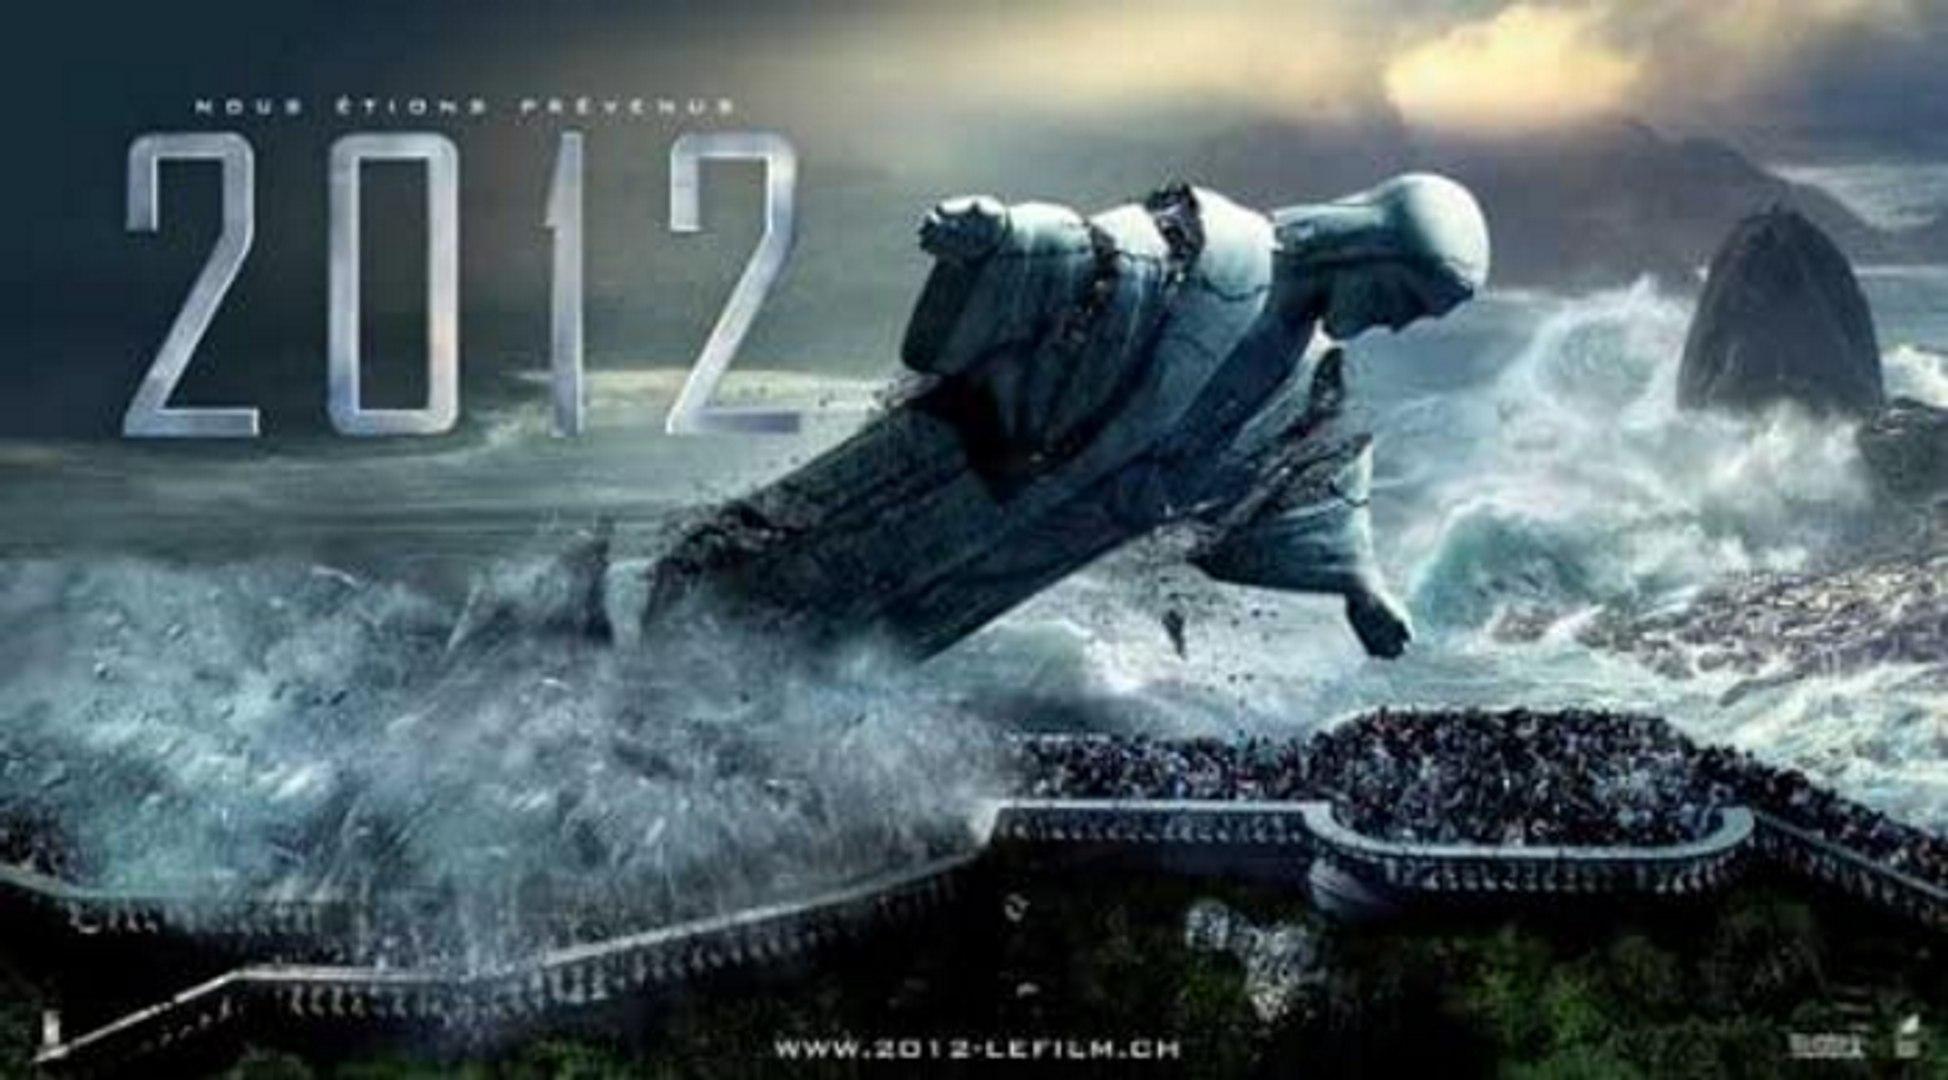 2012 Movie (2009) - John Cusack, Thandie Newton, Chiwetel Ejiofor ...